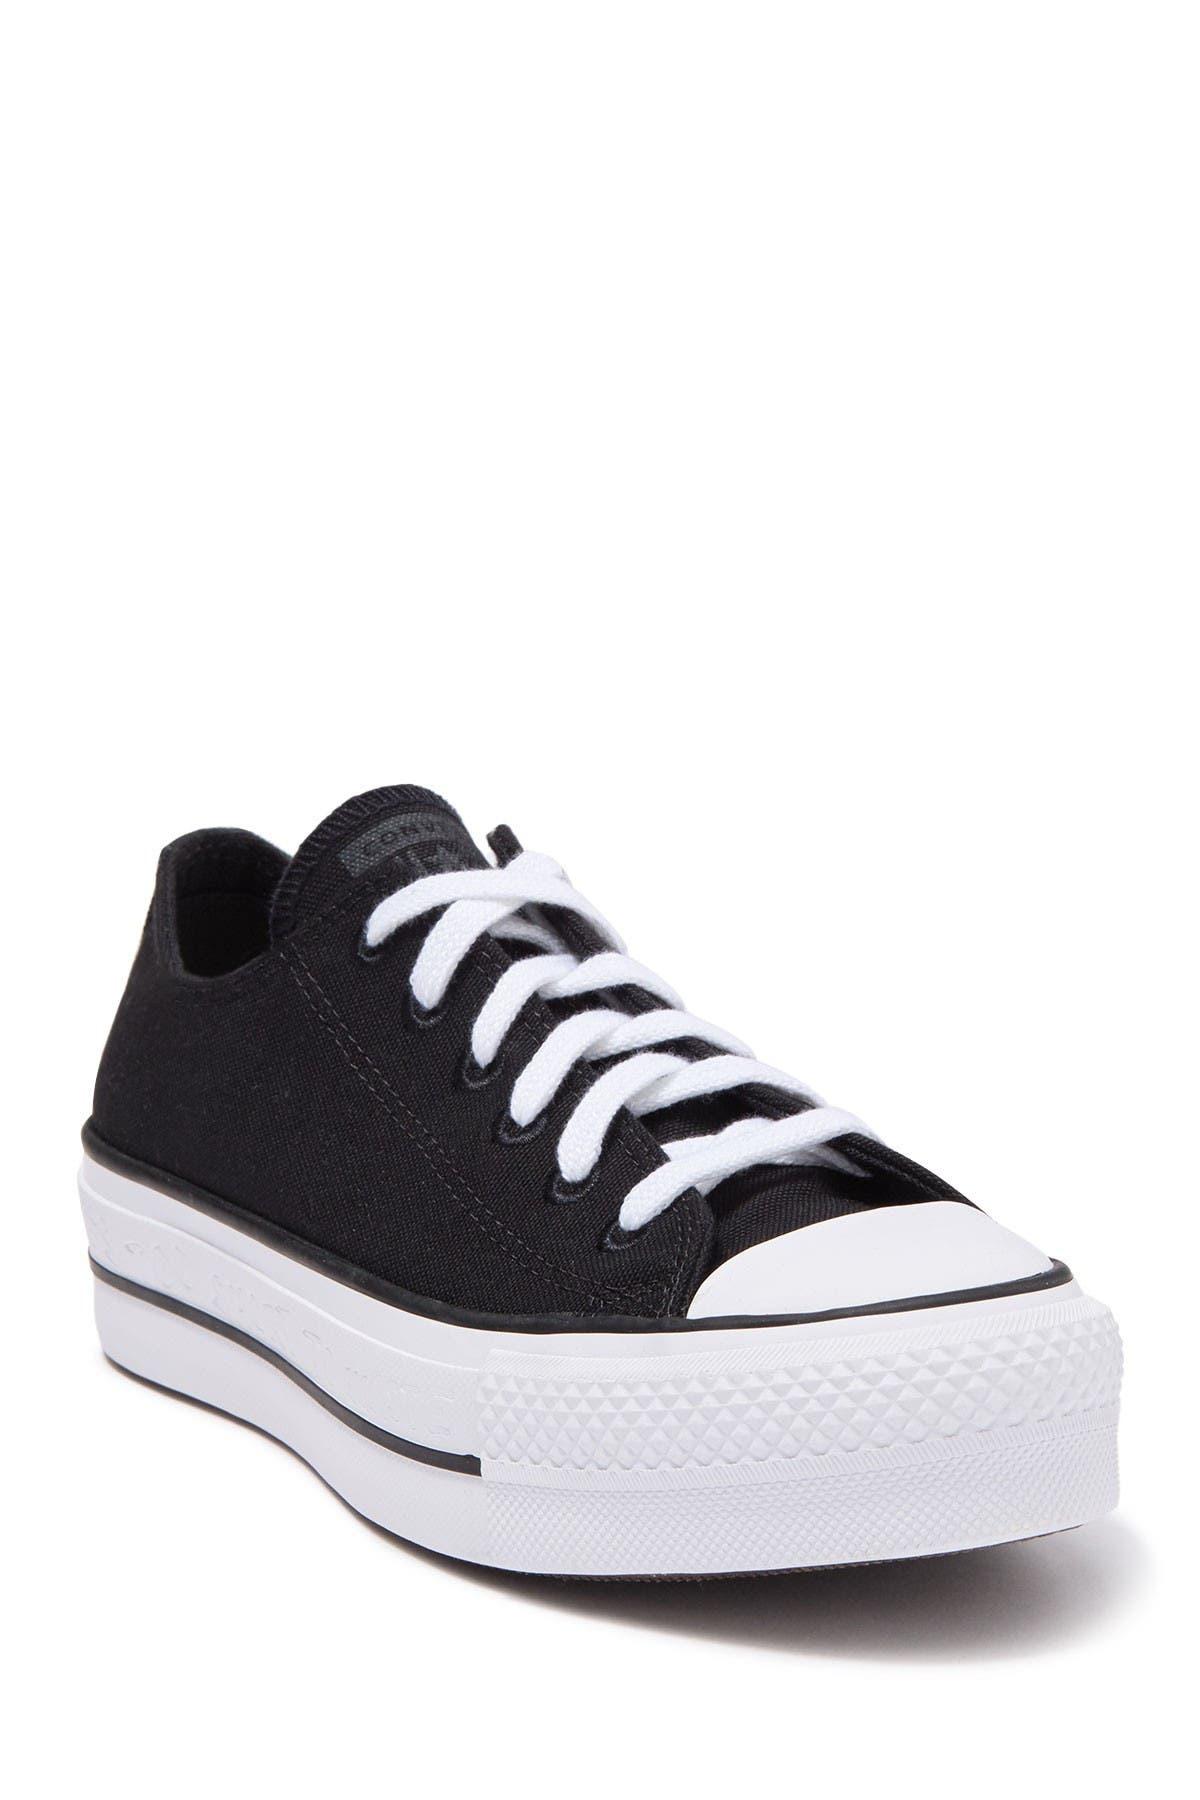 converse chuck taylor ox platform white sneakers